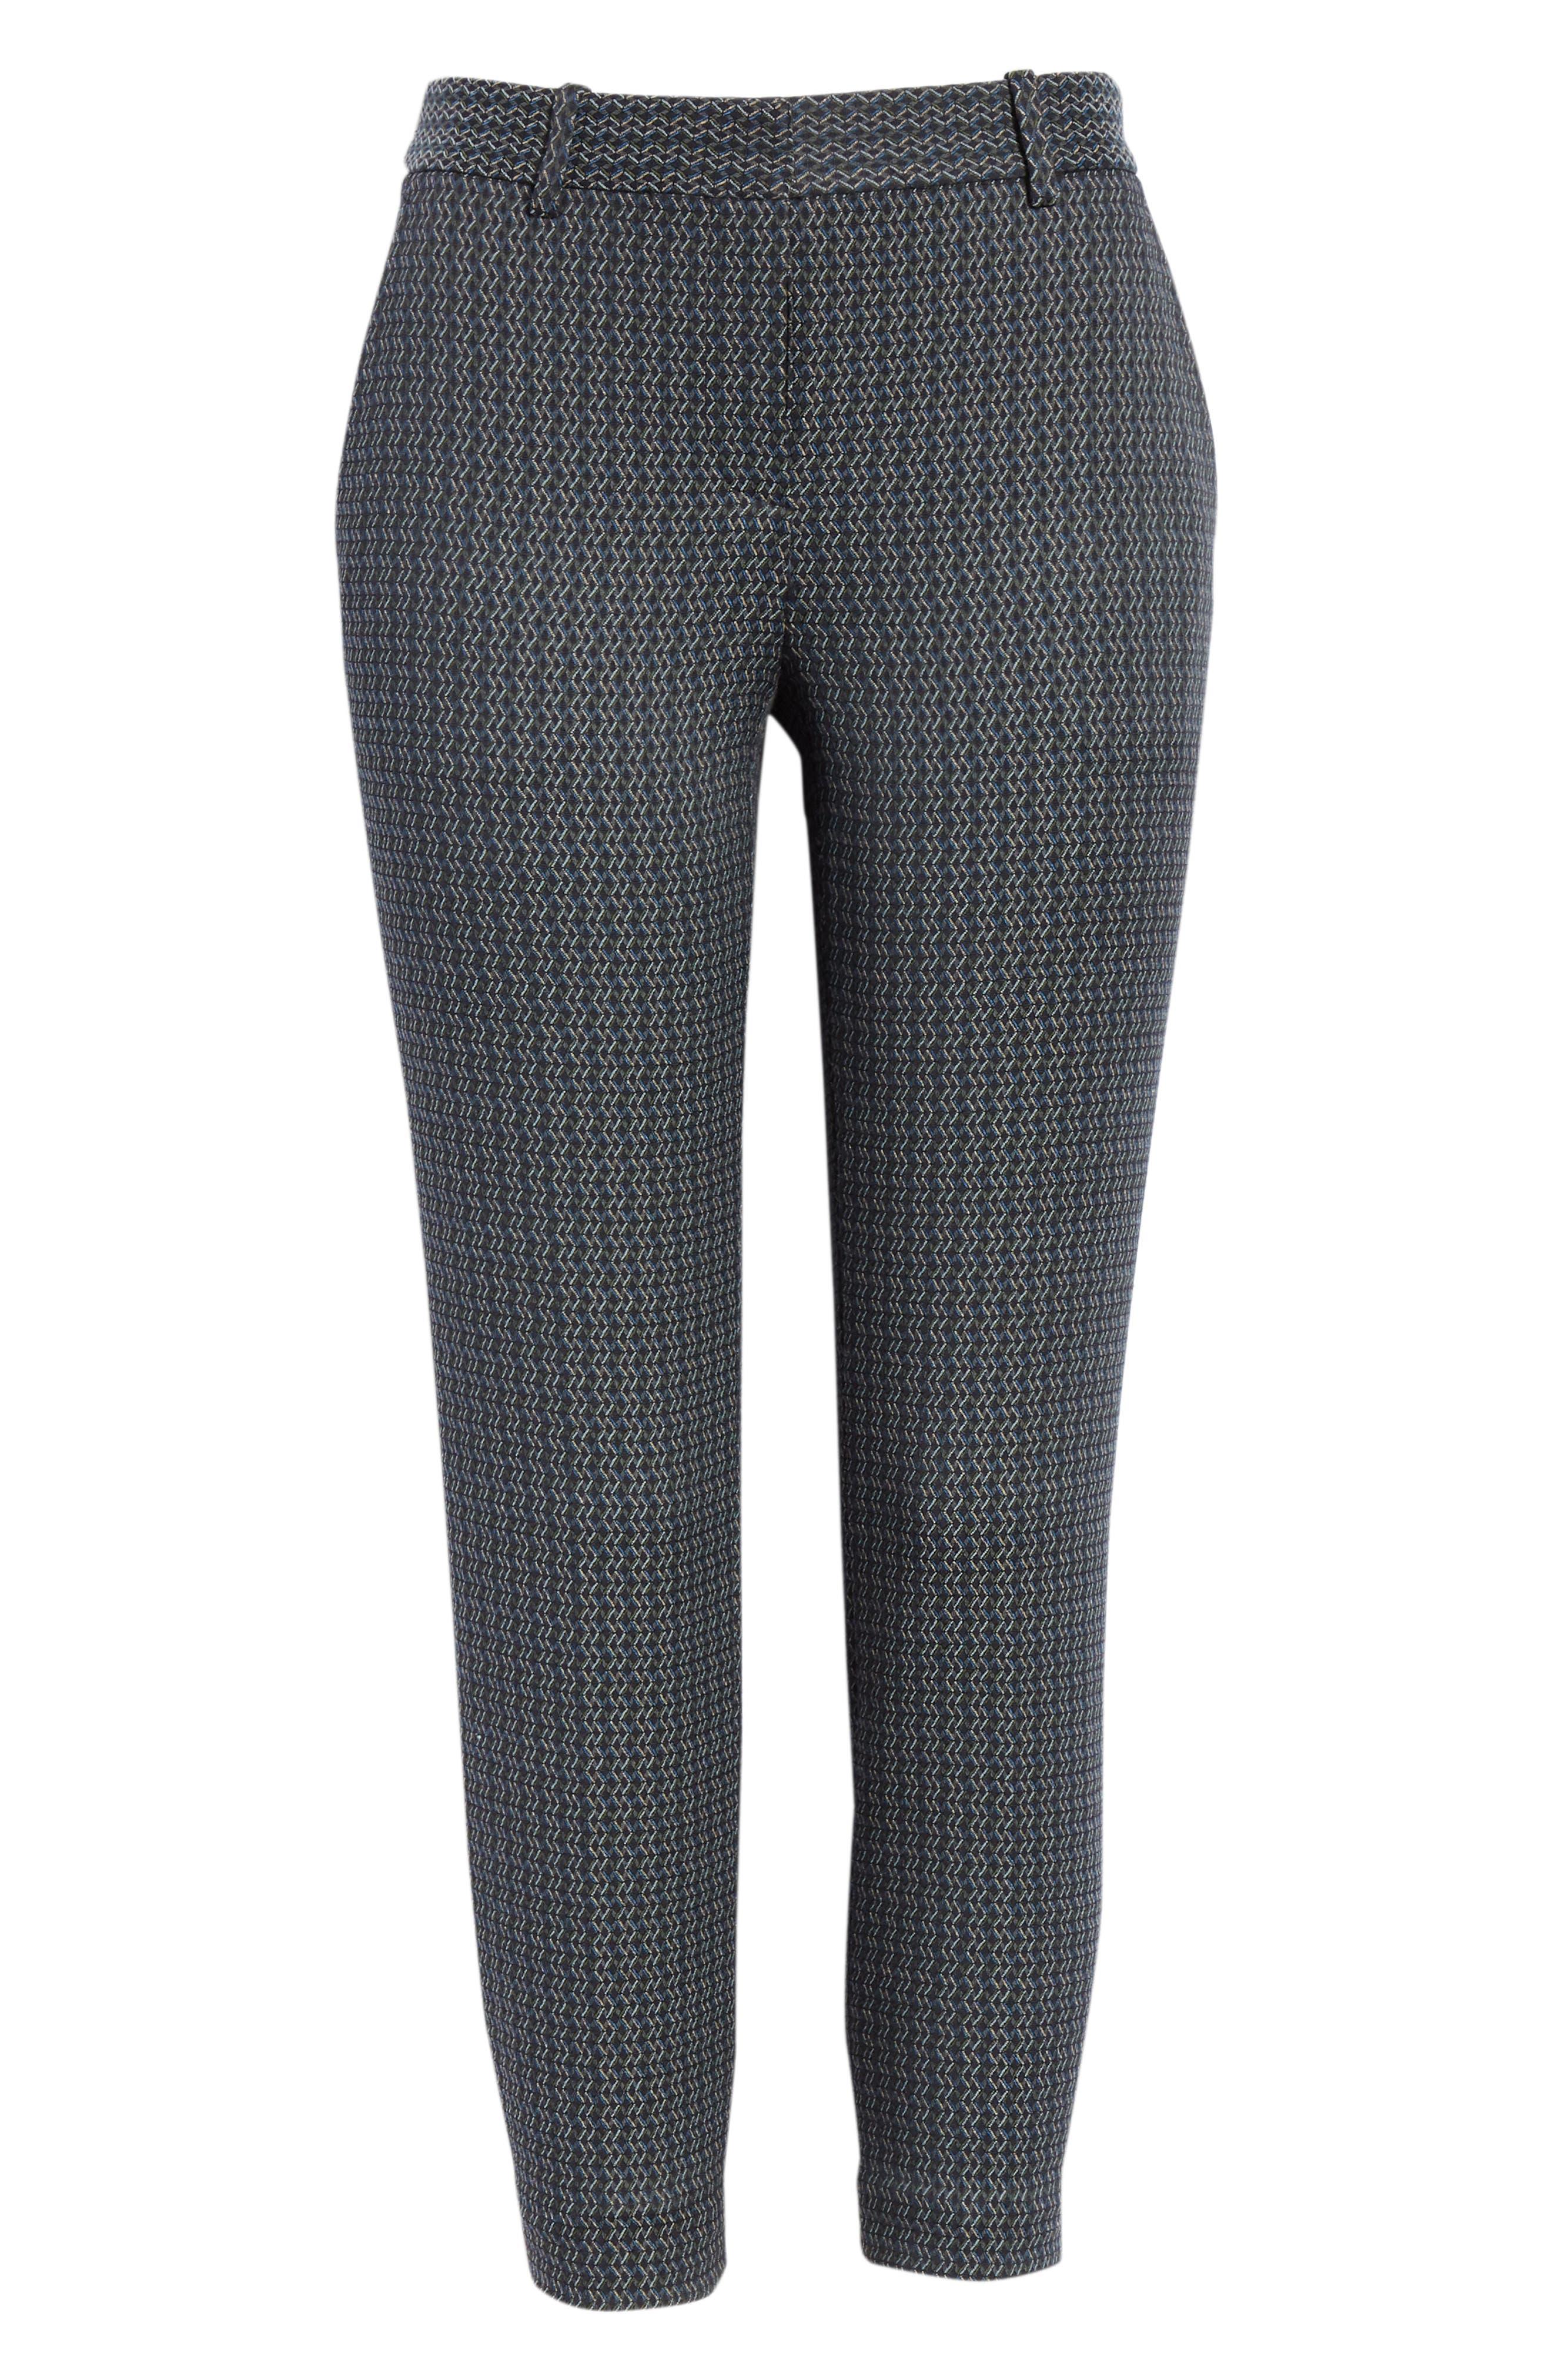 Treeca Shadow Jacquard Slim Crop Pants,                             Alternate thumbnail 6, color,                             MULTI